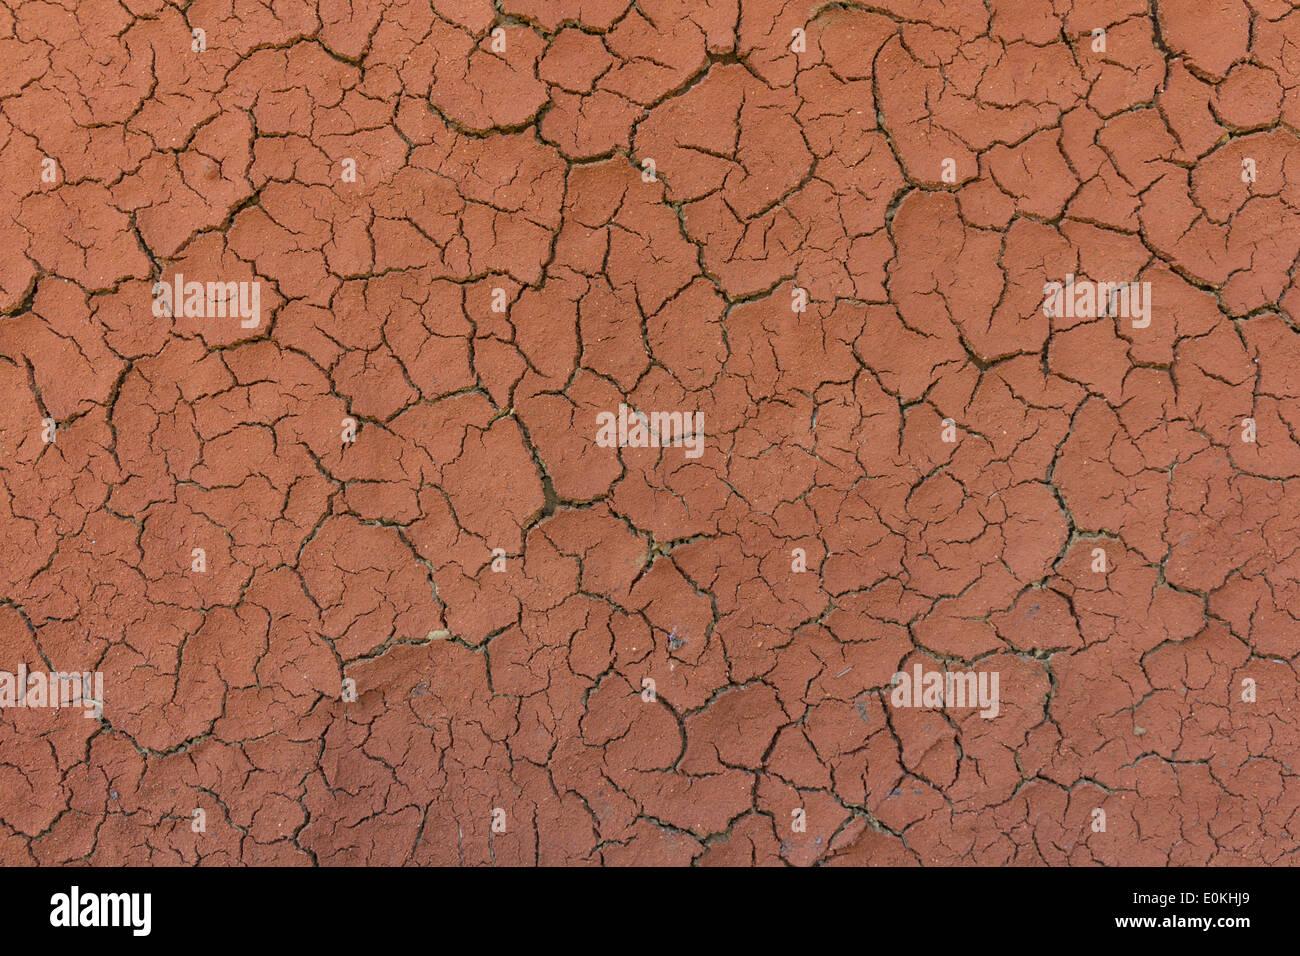 Cracked ground texture - Stock Image